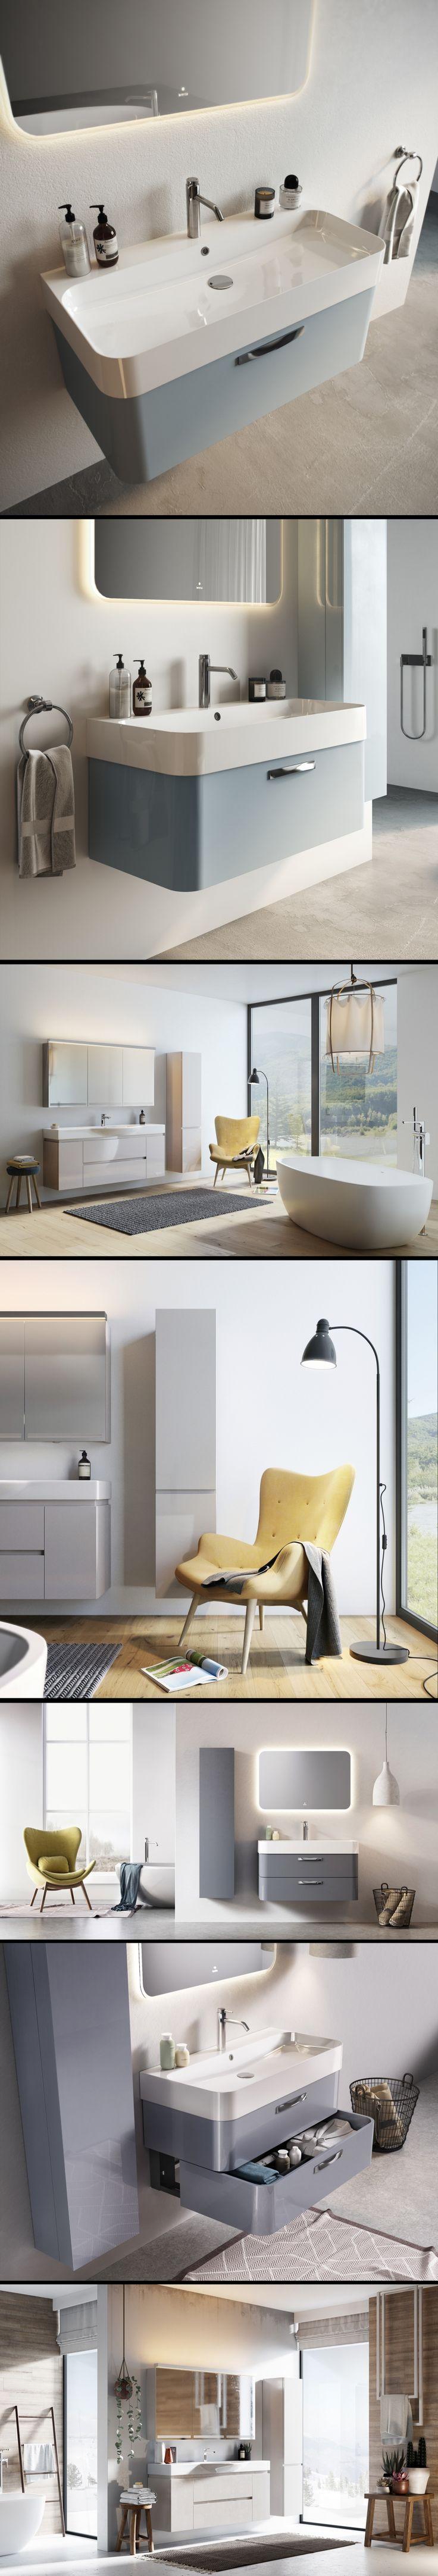 Visualization of furniture - Галерея 3ddd.ru